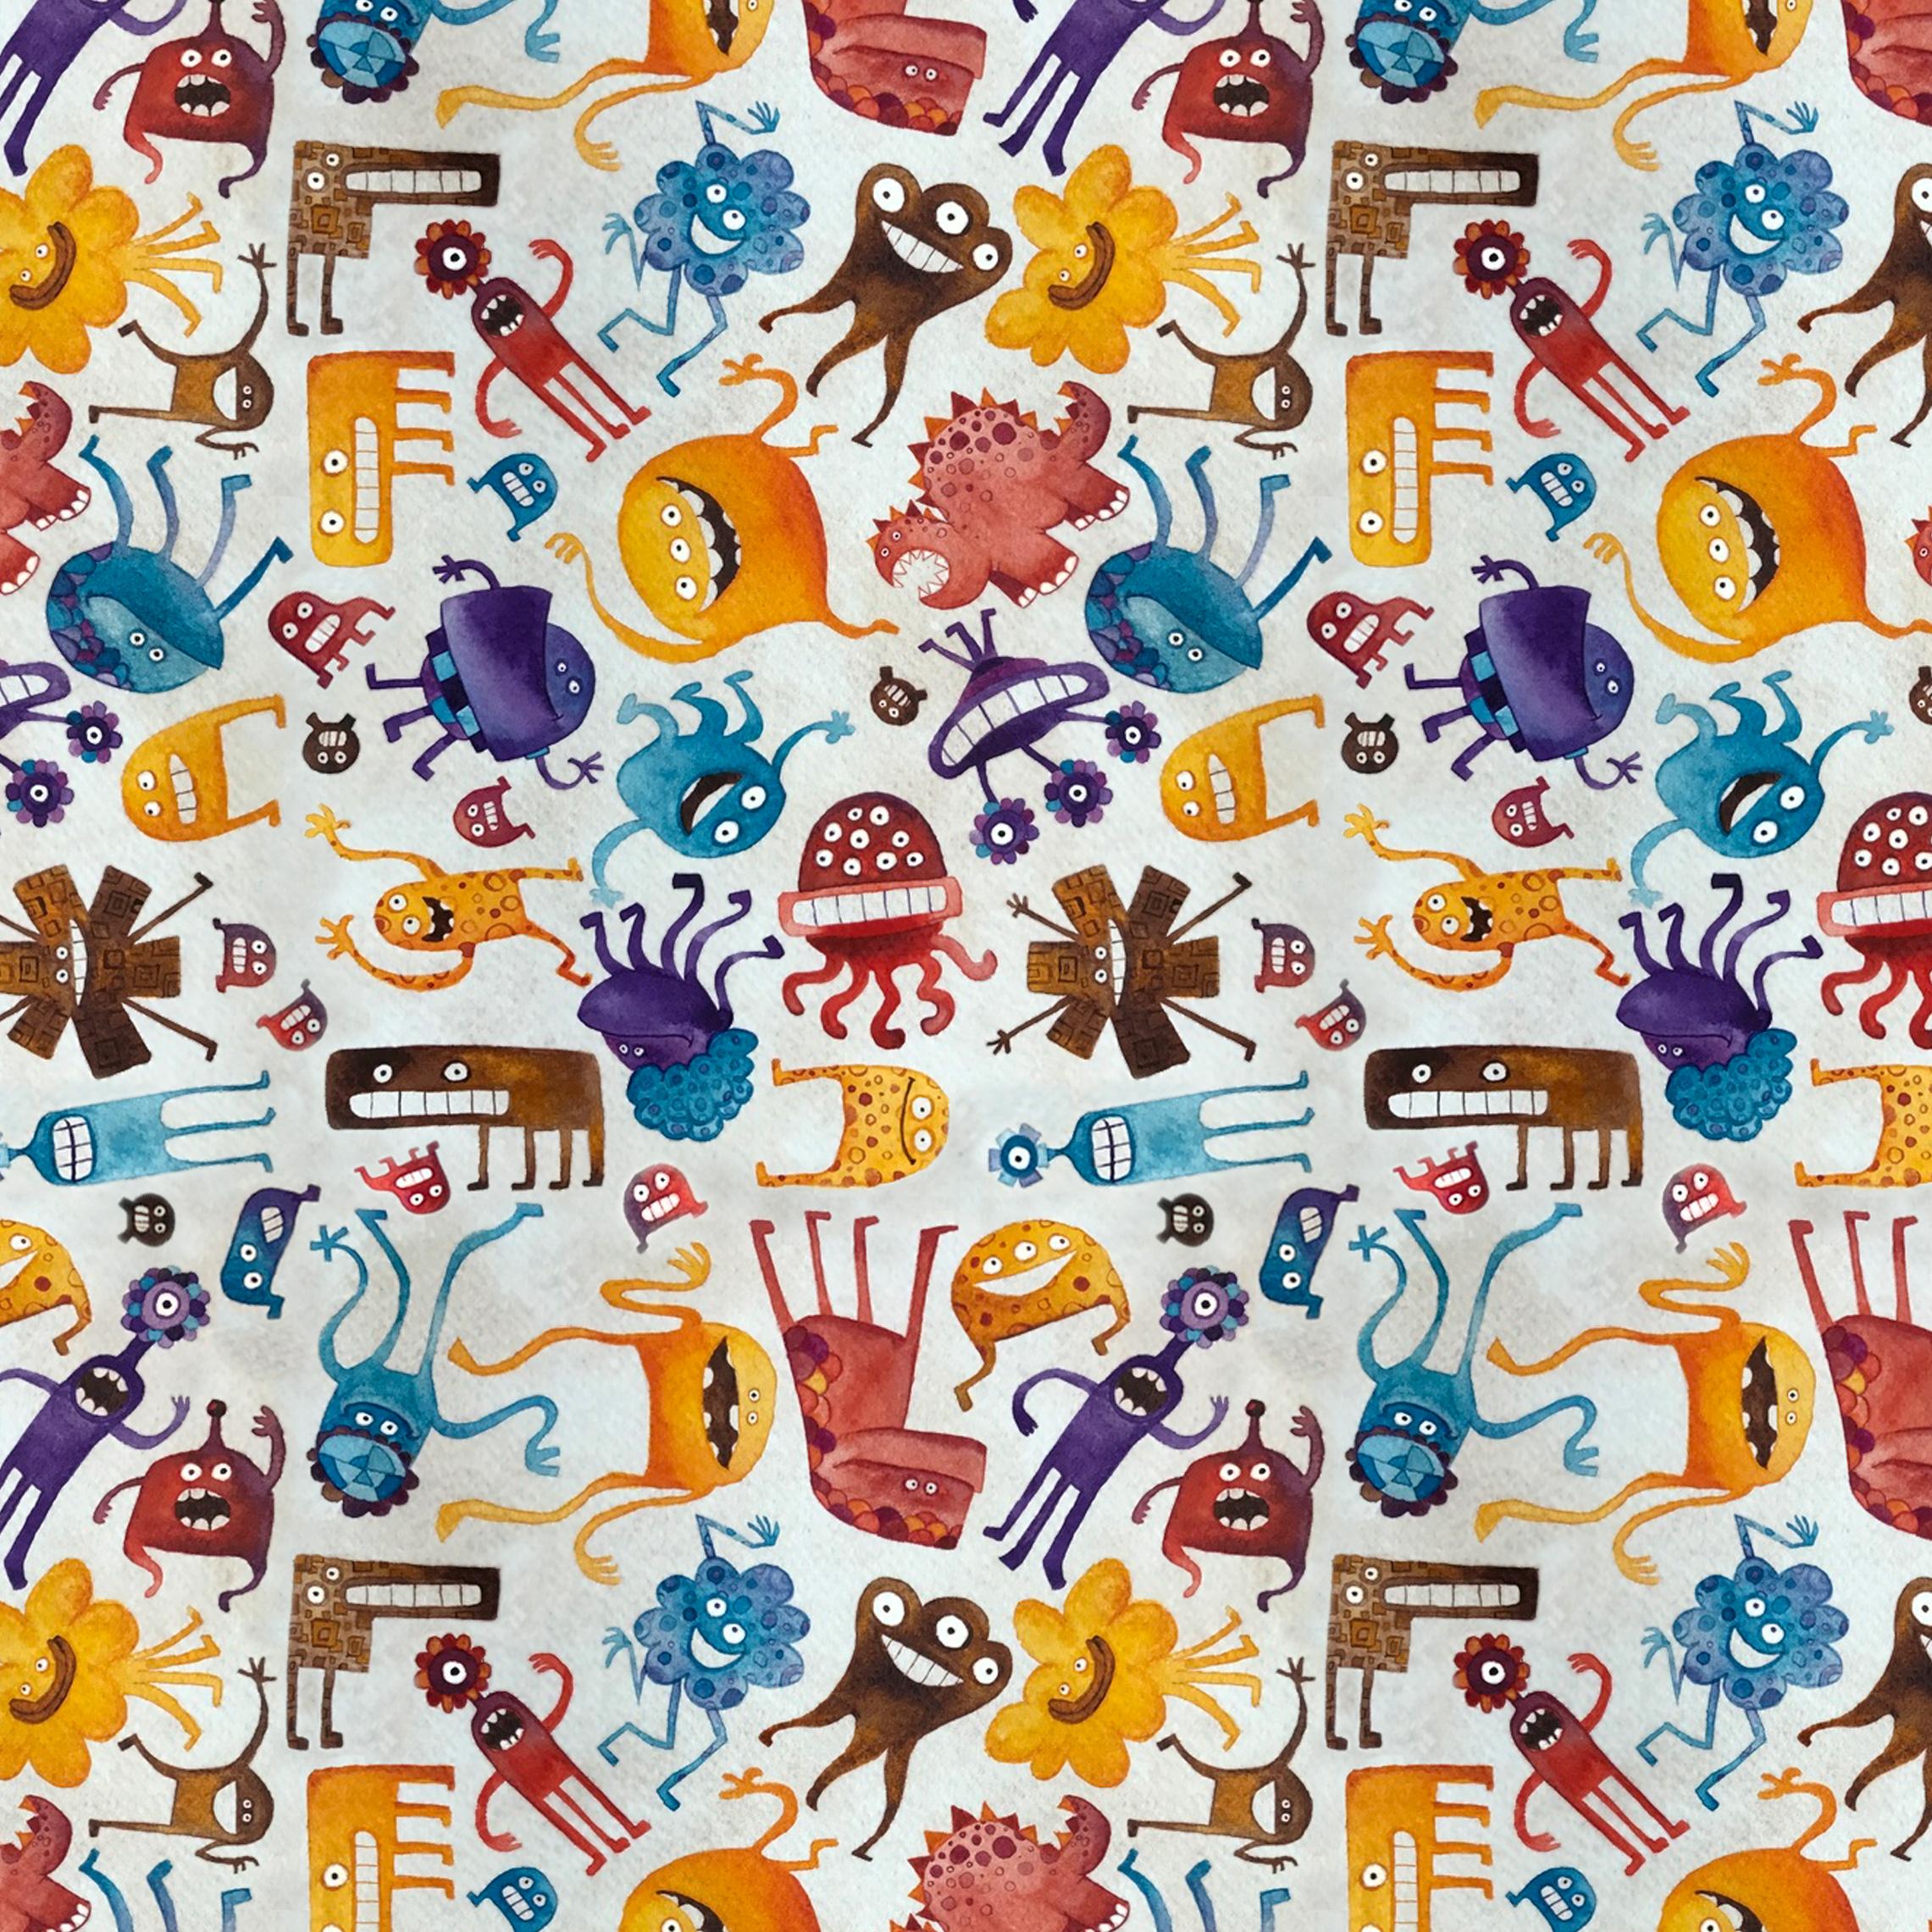 Critter pattern 3